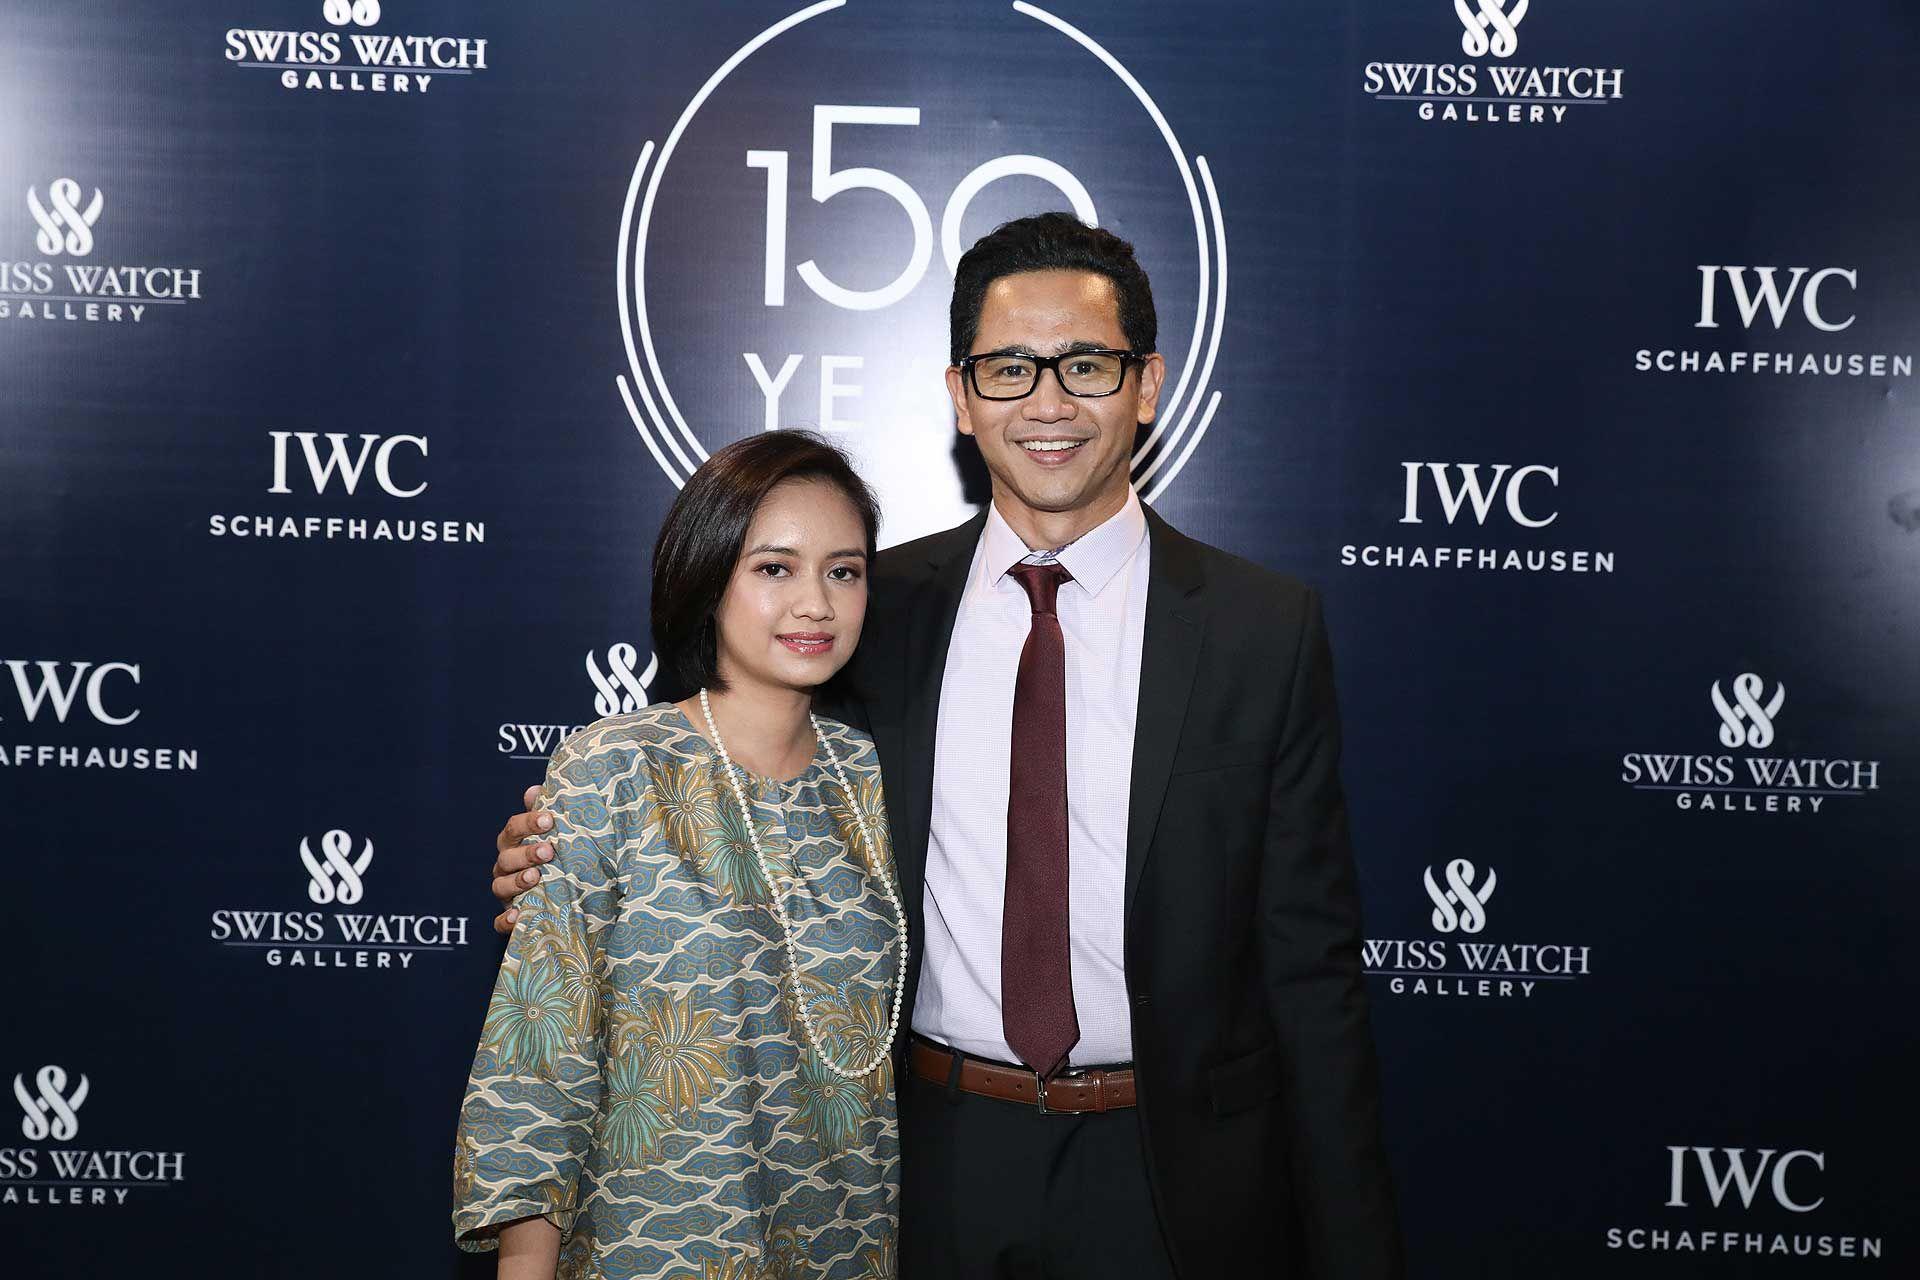 Wan Zalia and Arzumy MD